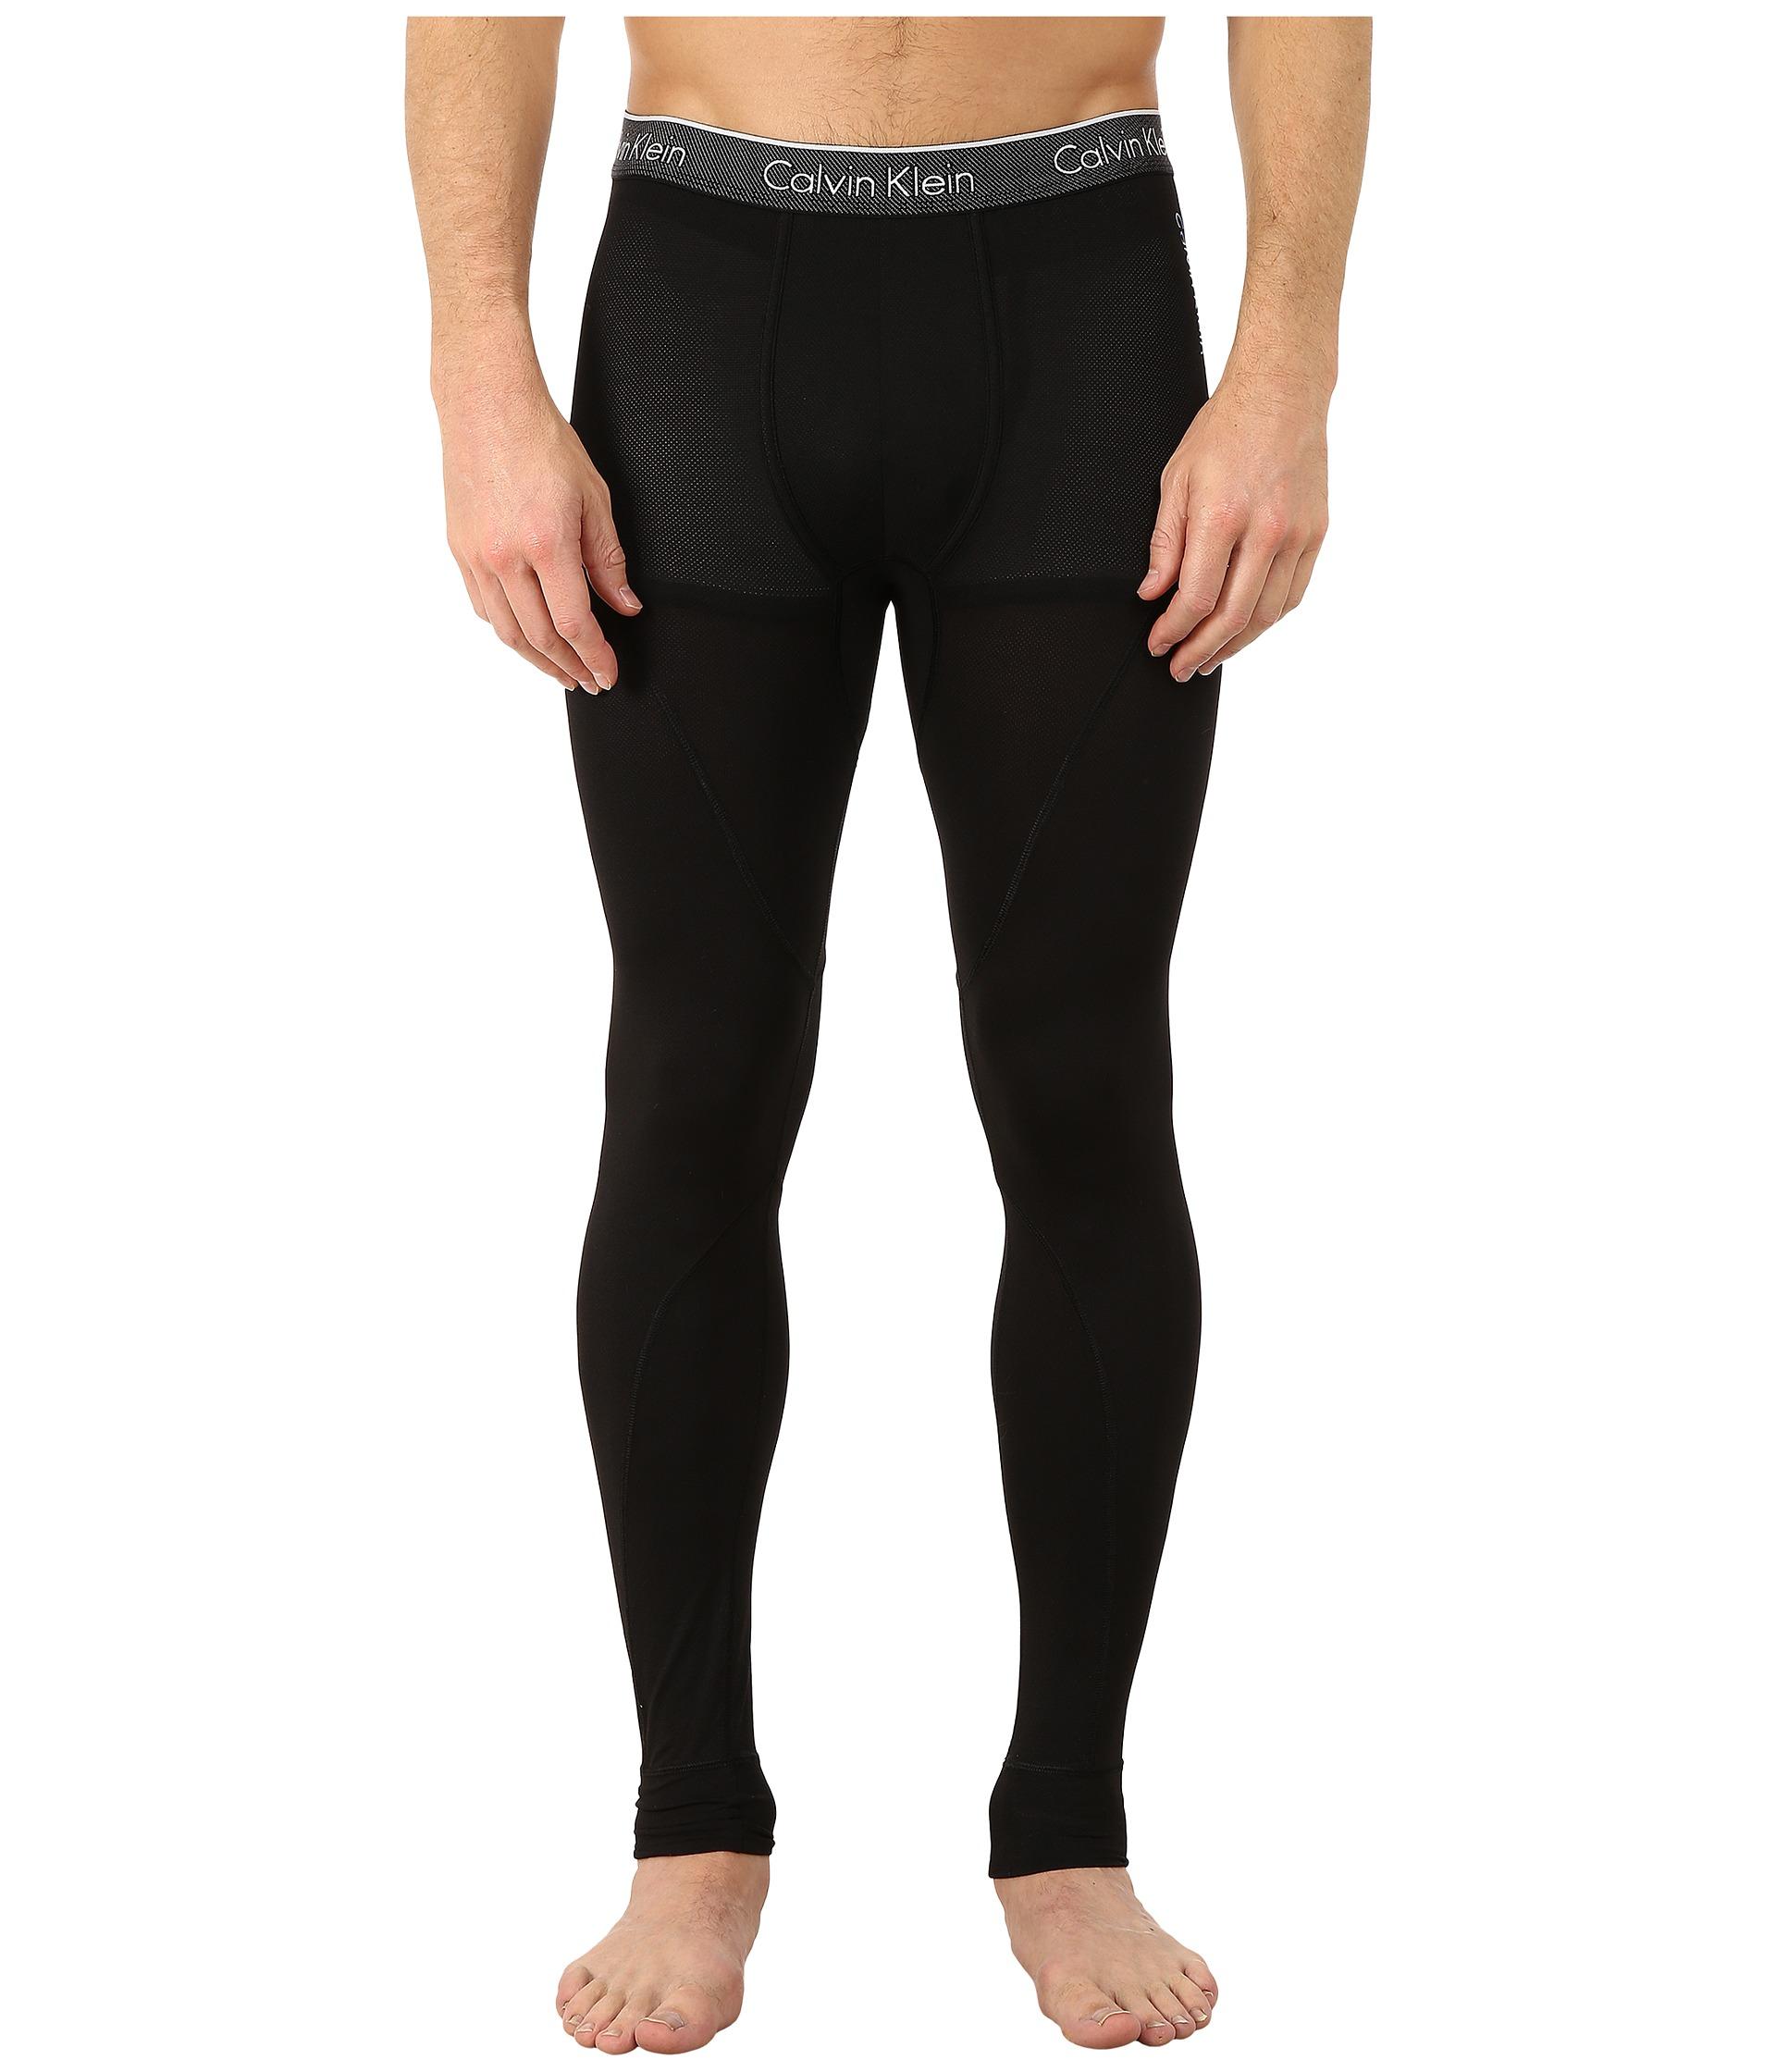 calvin klein underwear air micro leggings black free shipping both ways. Black Bedroom Furniture Sets. Home Design Ideas